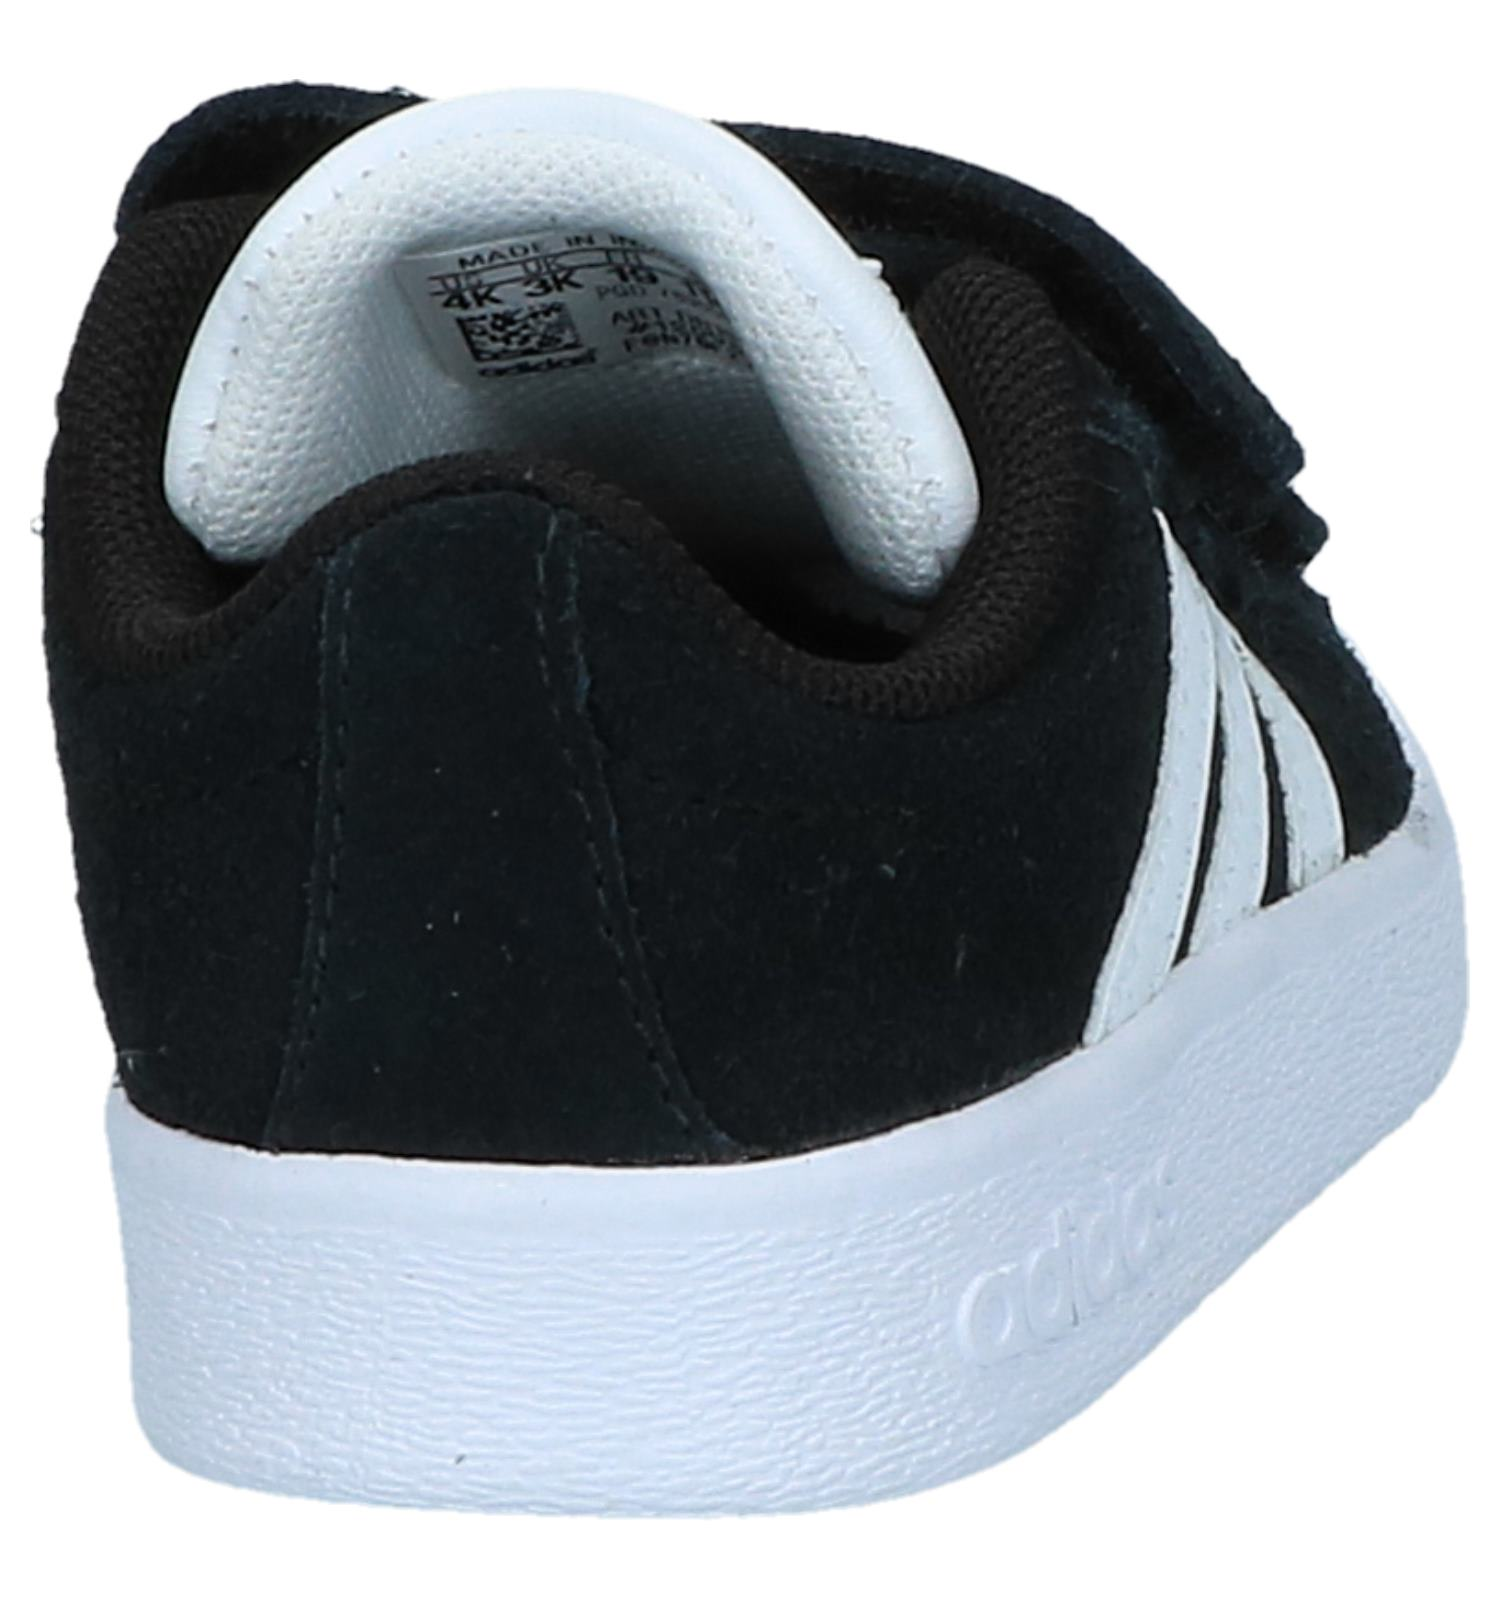 572fc723e73 Zwarte Sneakers met Velcro adidas VL Court 2.0 | TORFS.BE | Gratis verzend  en retour